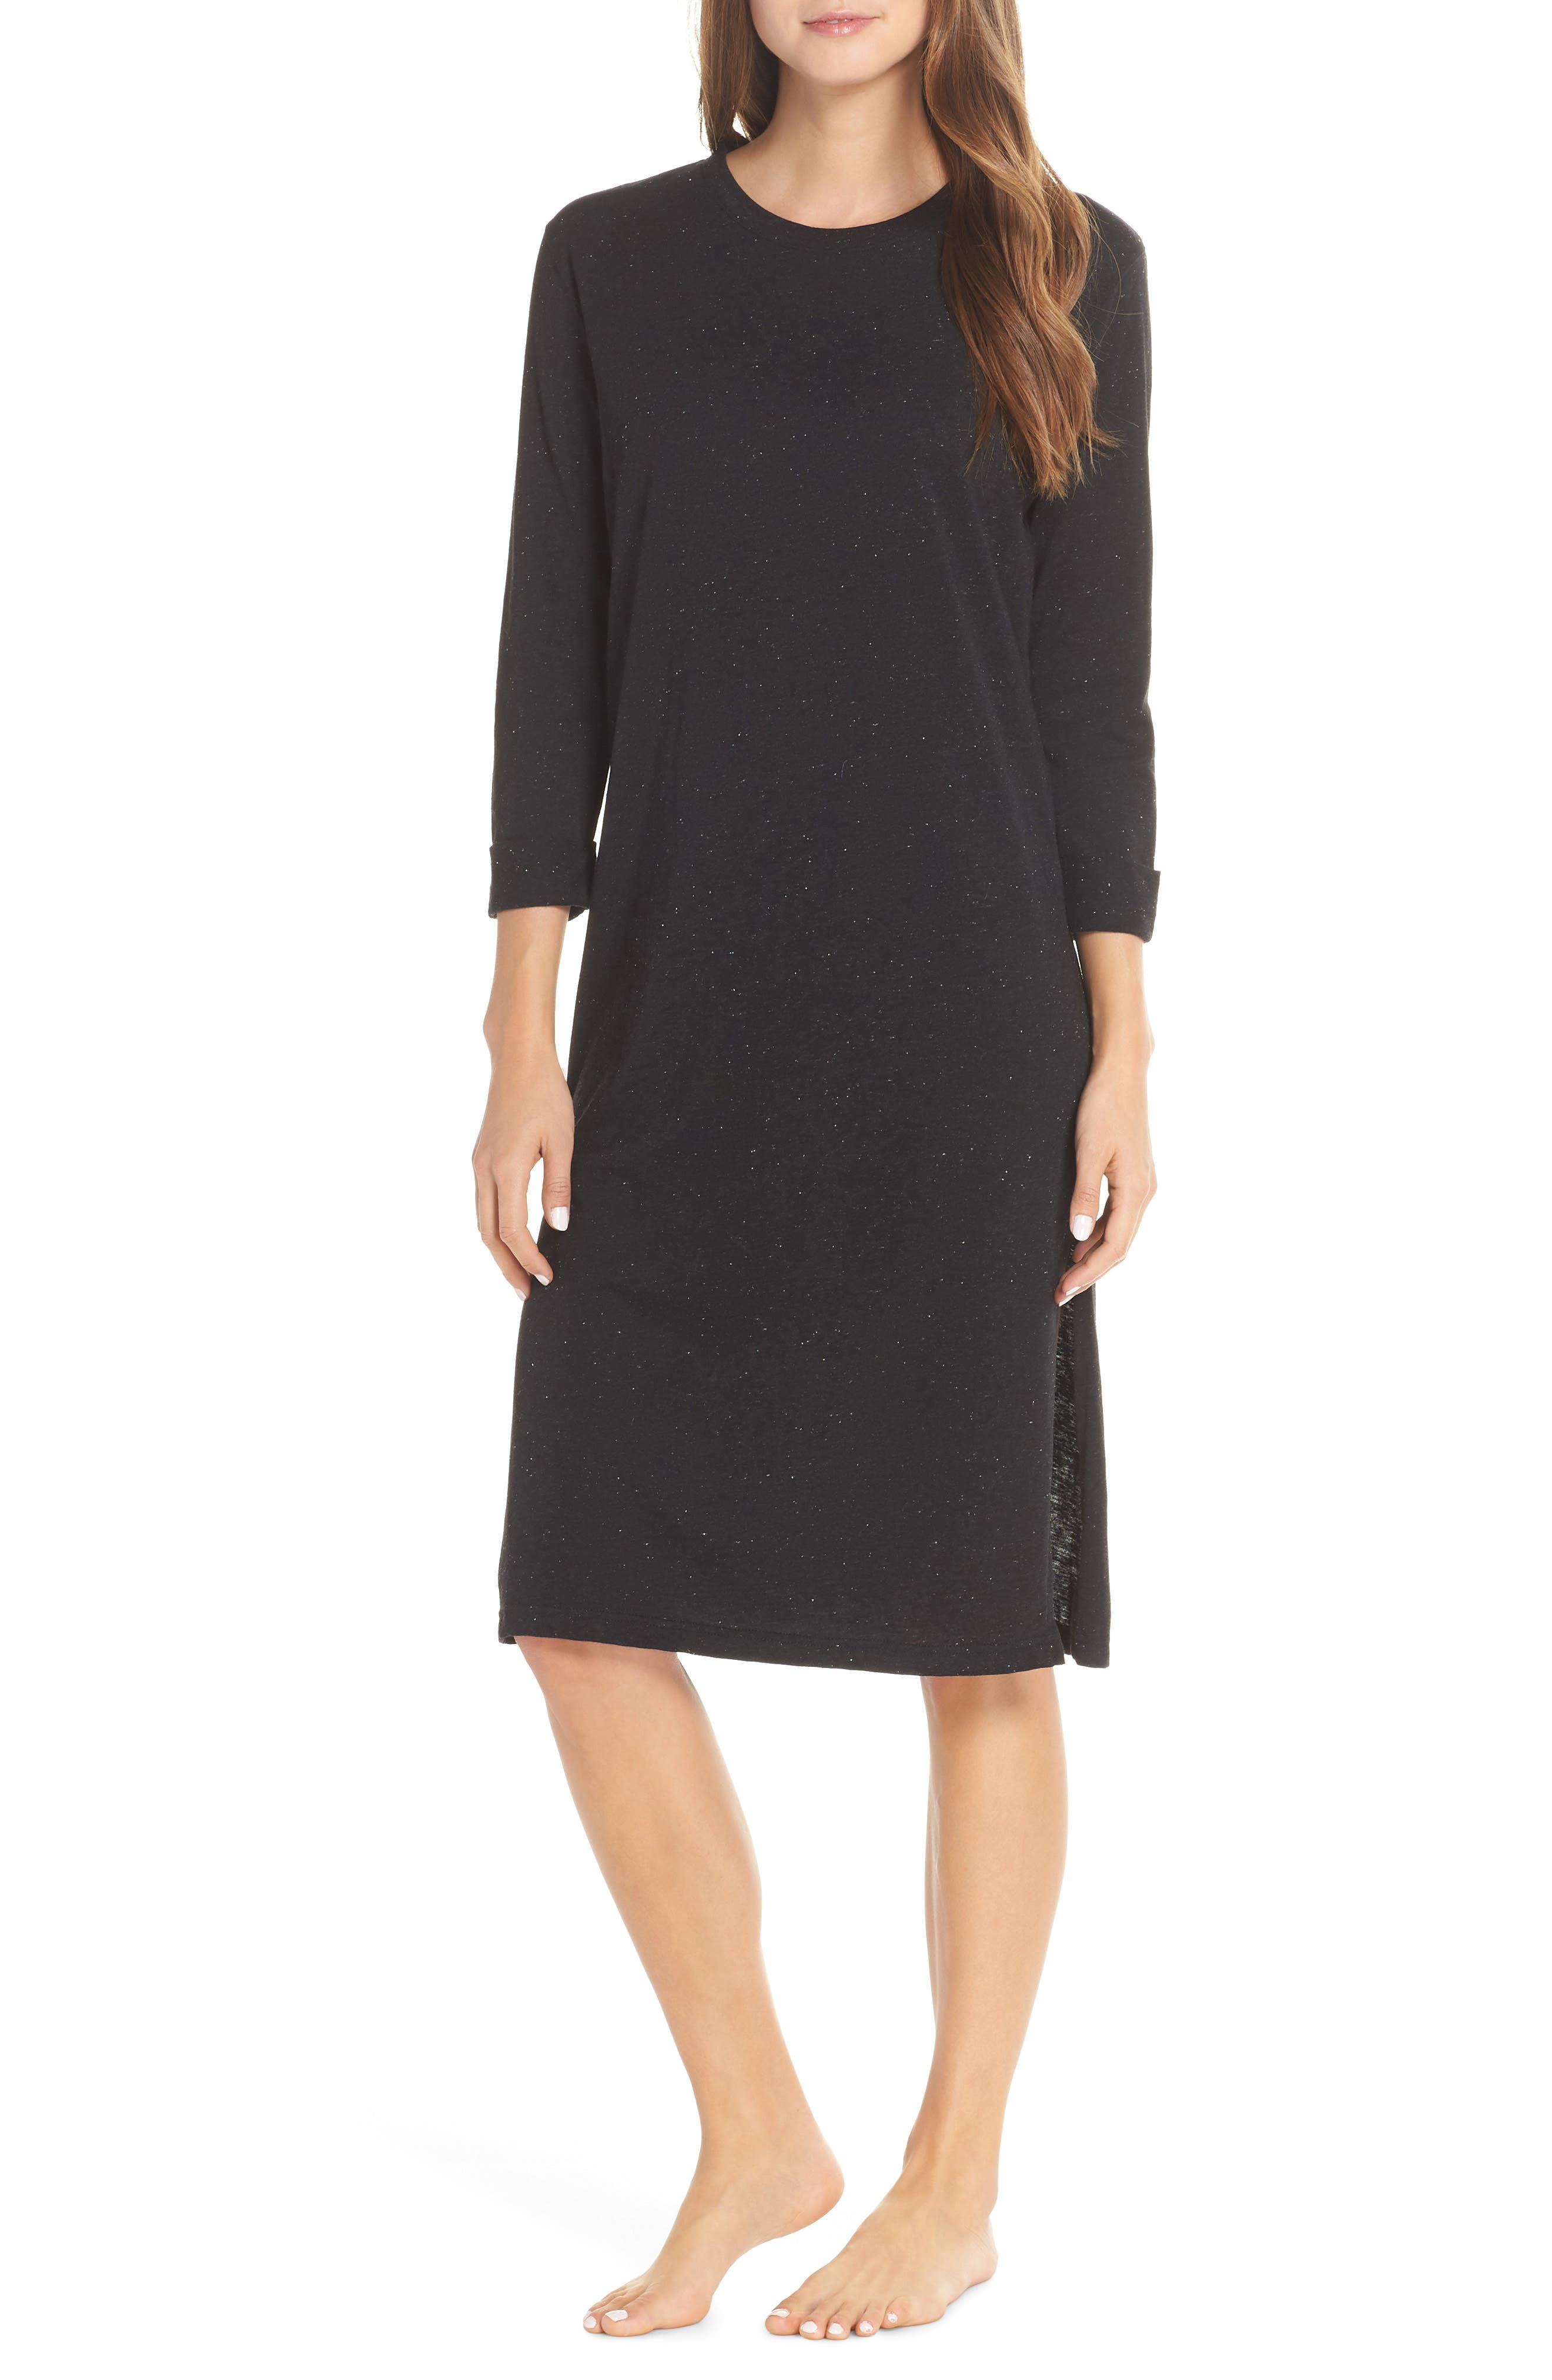 CHALMERS Juniper Lounge Dress, Main, color, CHARCOAL SPECKLE